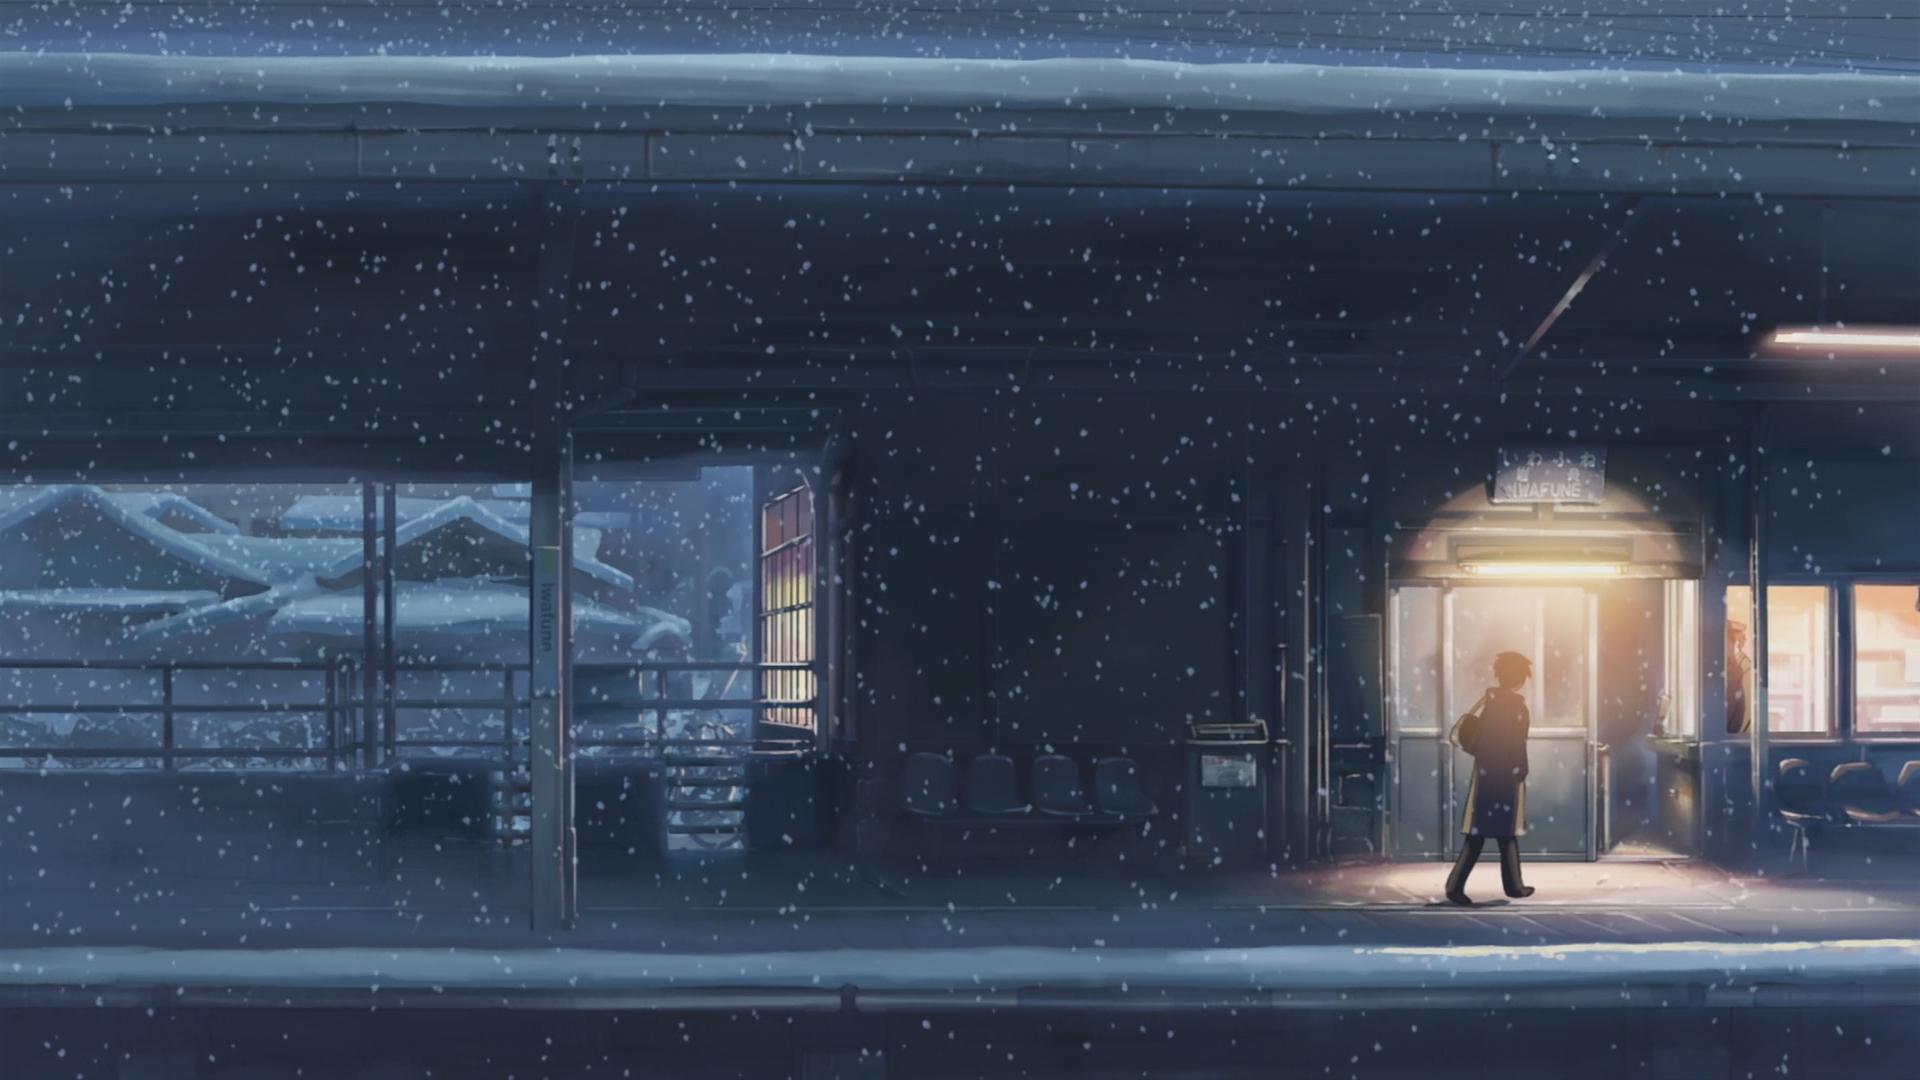 Makoto Shinkai 5 Centimeters Per Second Anime Wallpaper Anime Wallpaper 1920x1080 Anime Scenery Aesthetic Anime